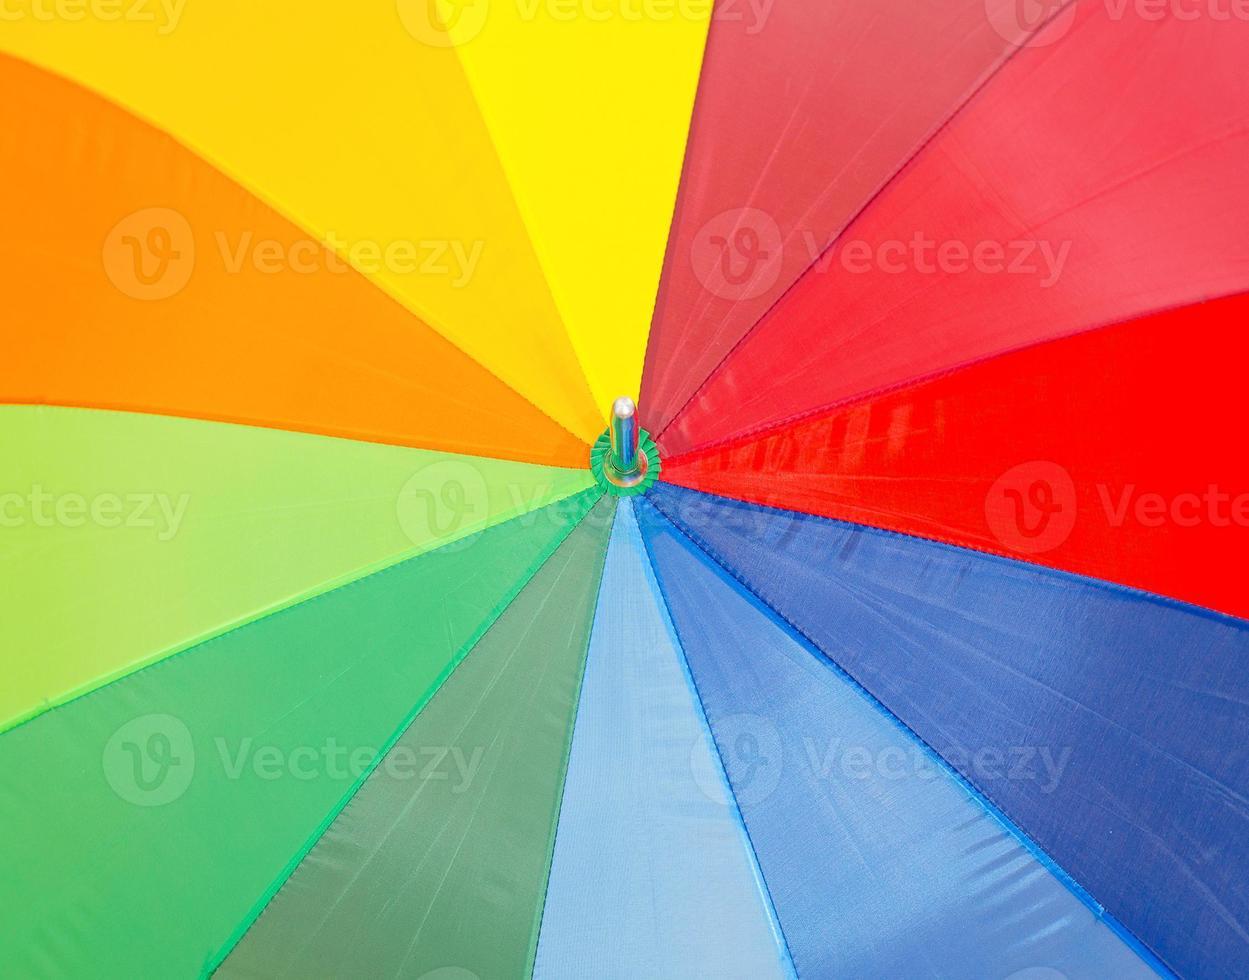 close-up vista do guarda-chuva colorida. foto